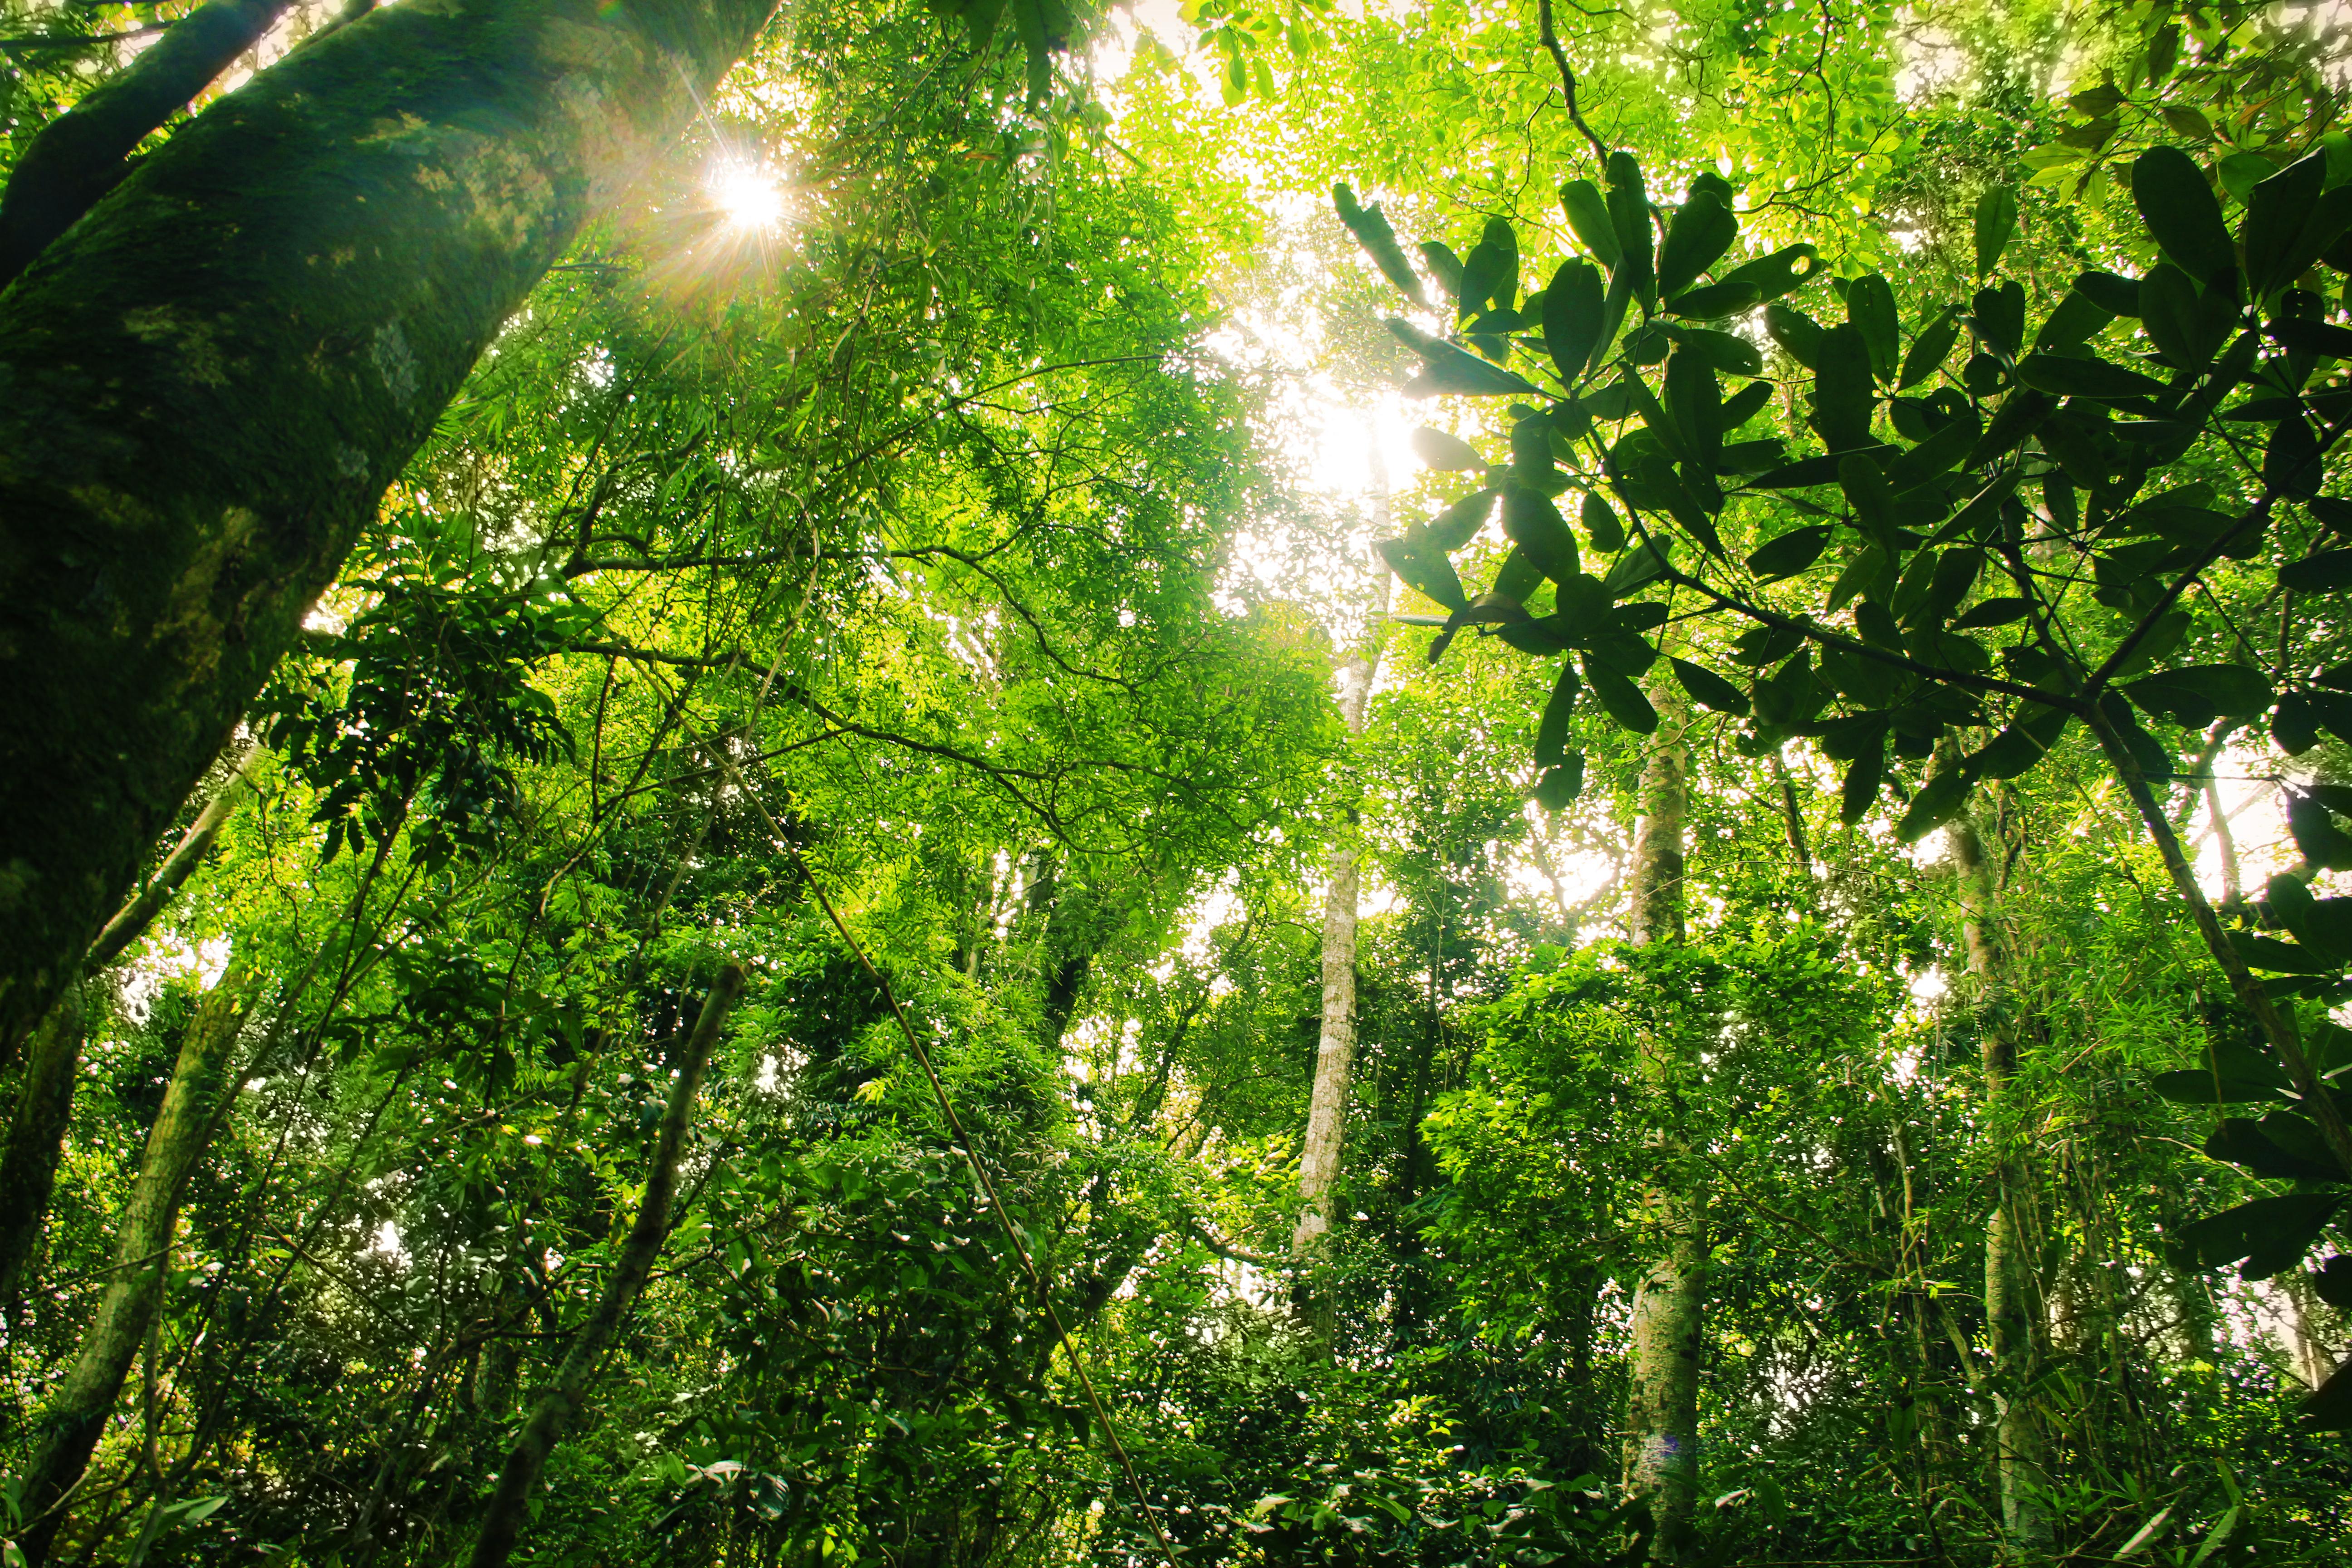 $10 million Rainforest XPrize to help preserve the world's biodiversity